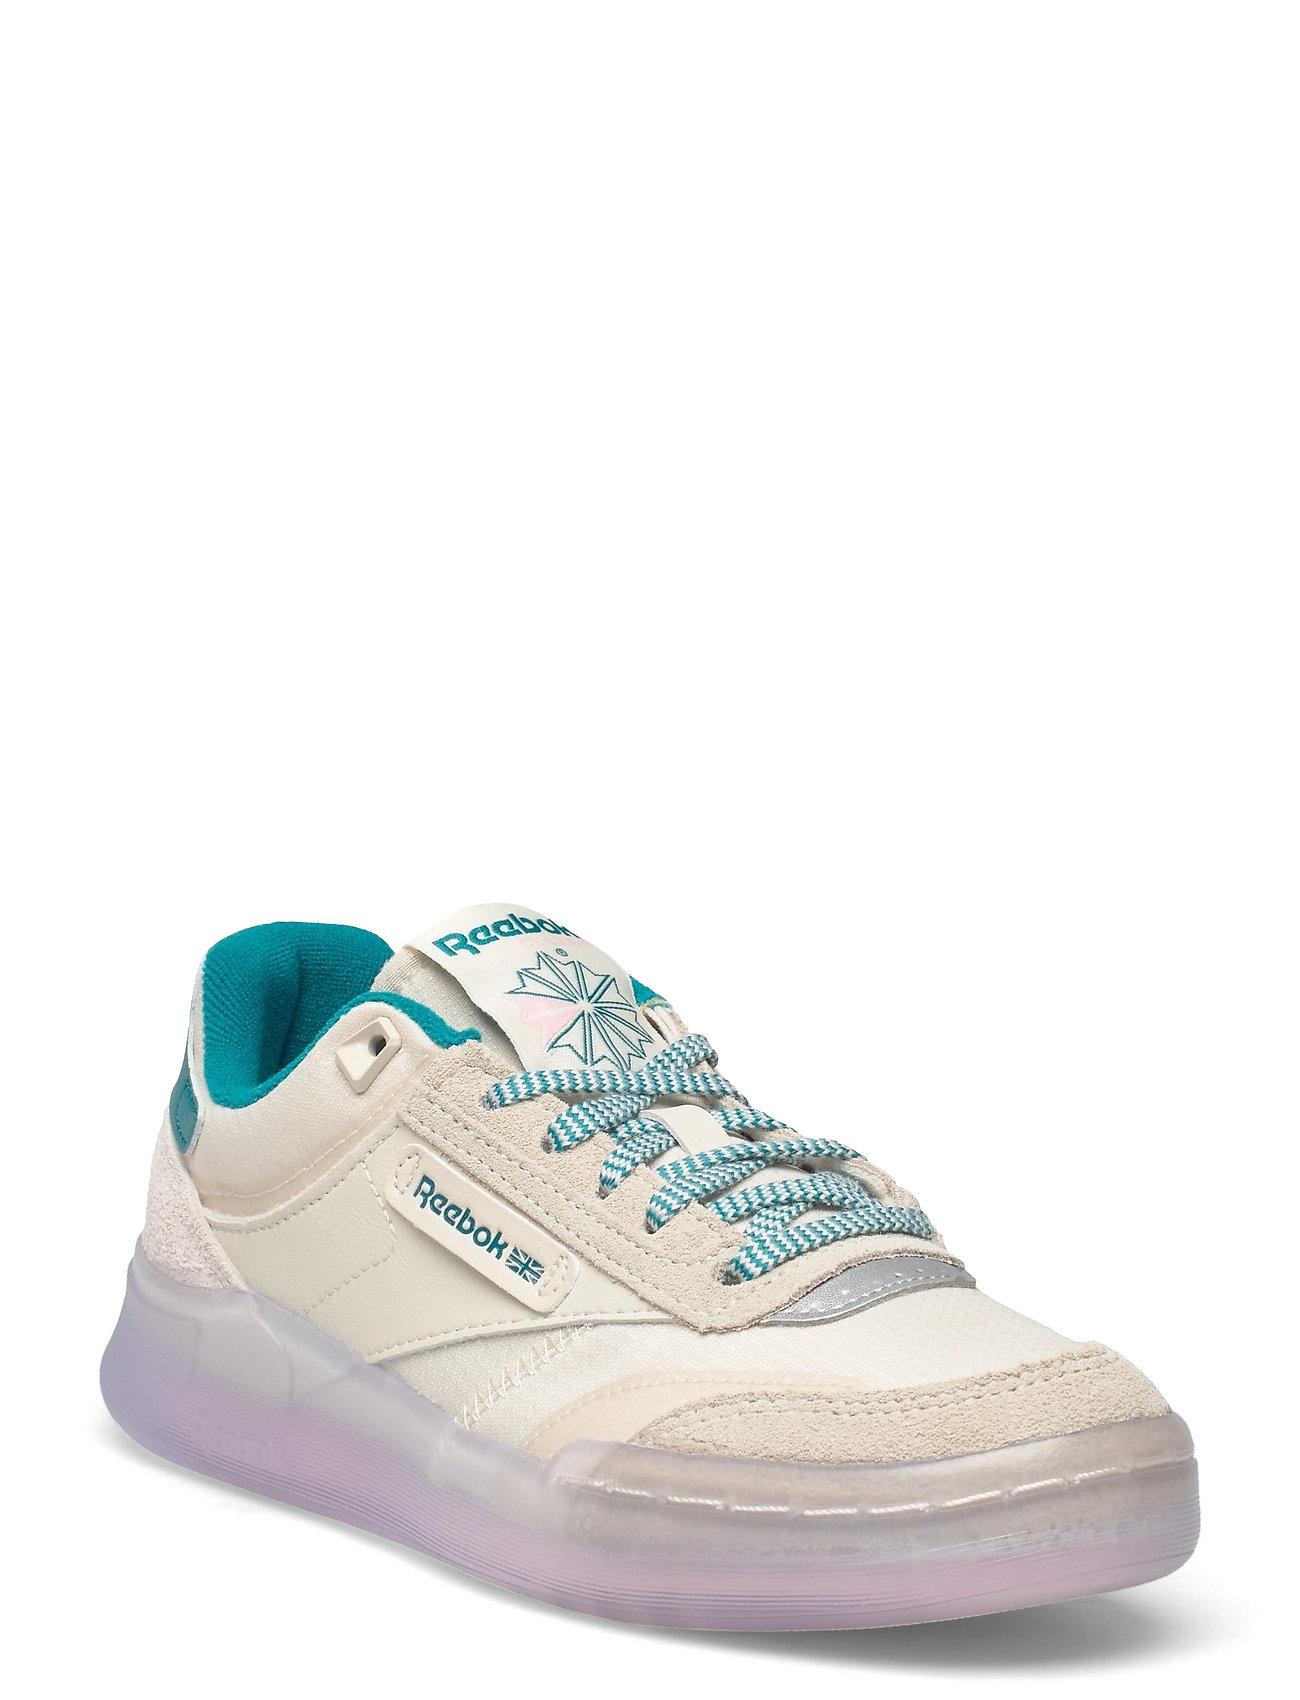 Club C Legacy Low-top Sneakers Hvid Reebok Classics